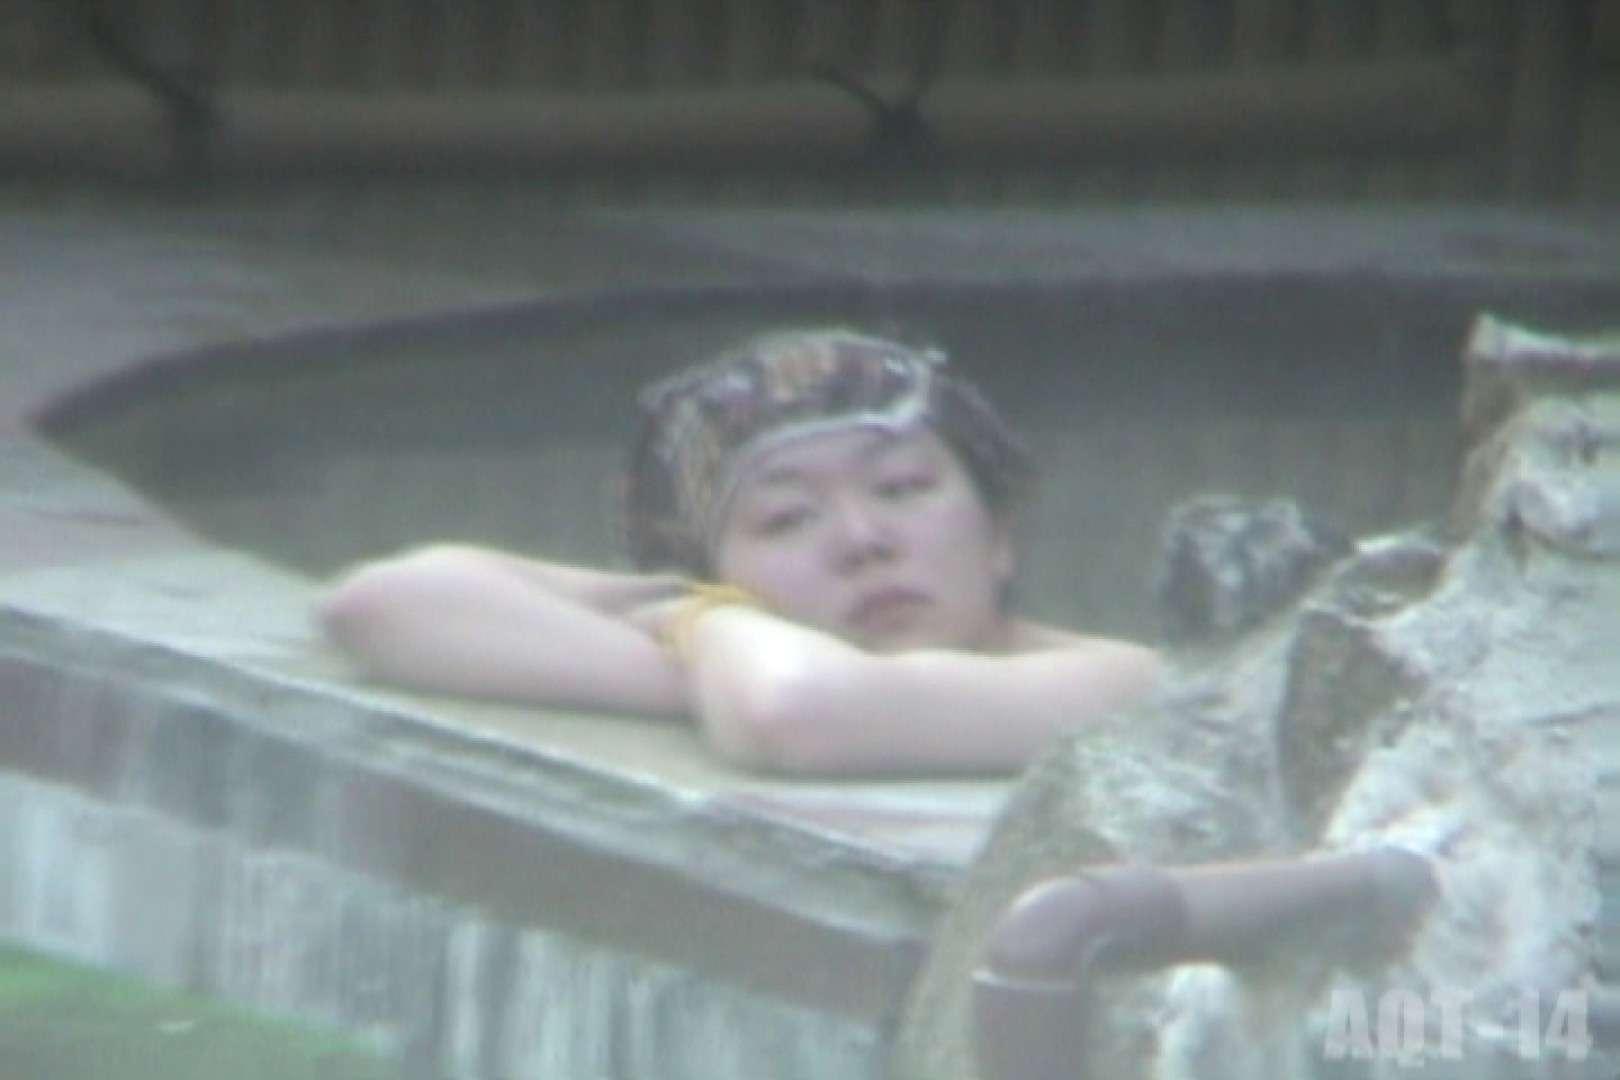 Aquaな露天風呂Vol.830 露天   HなOL  101pic 1